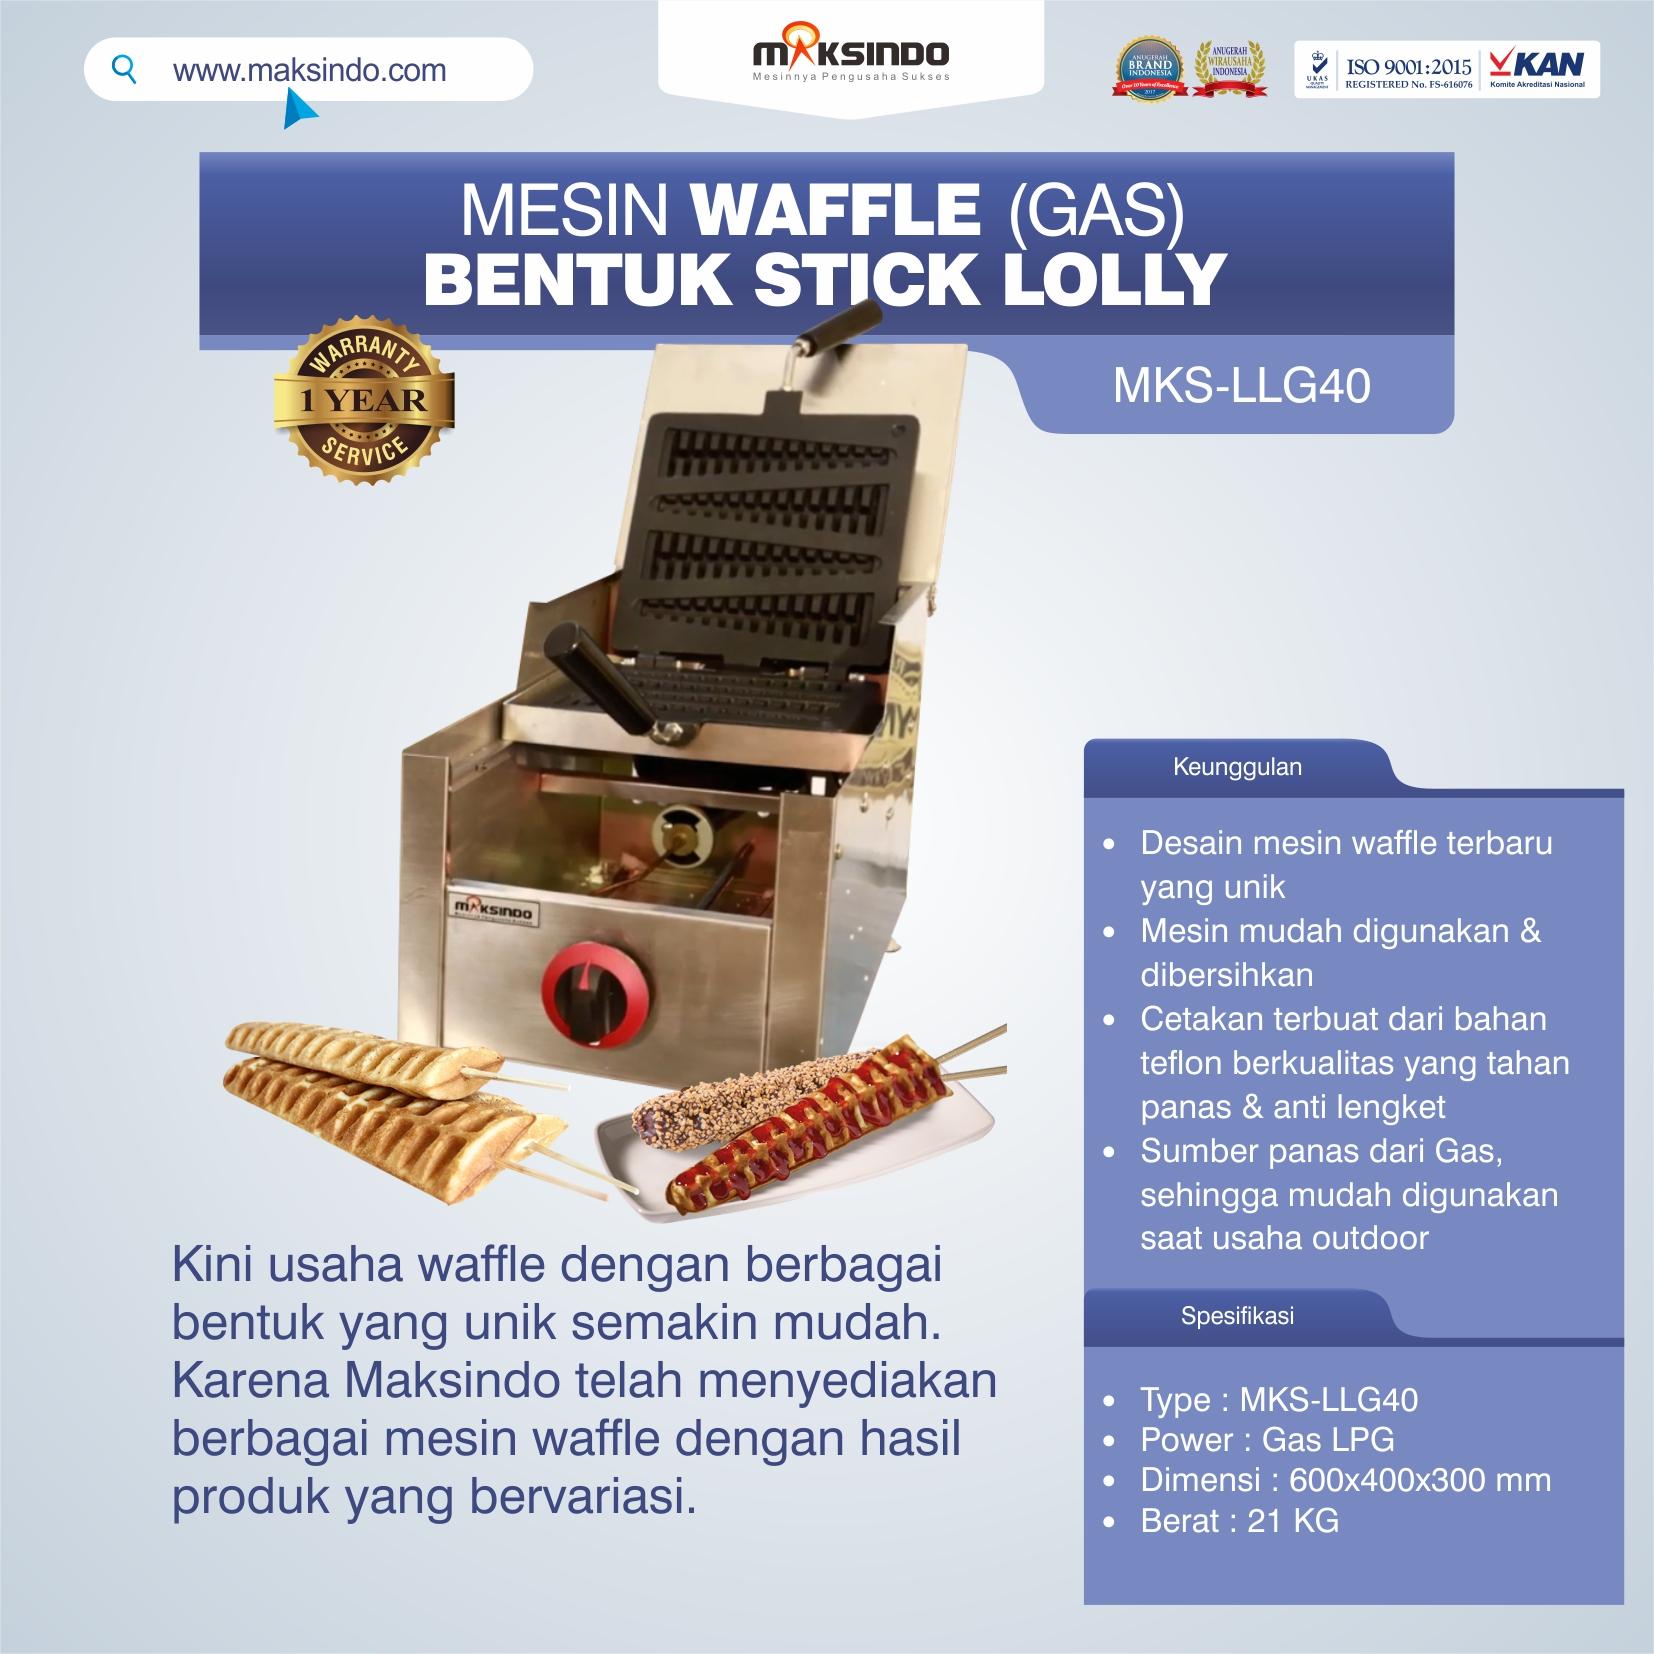 Jual Mesin Waffle Bentuk Stick Lolly (Gas) MKS-LLG40 di Semarang